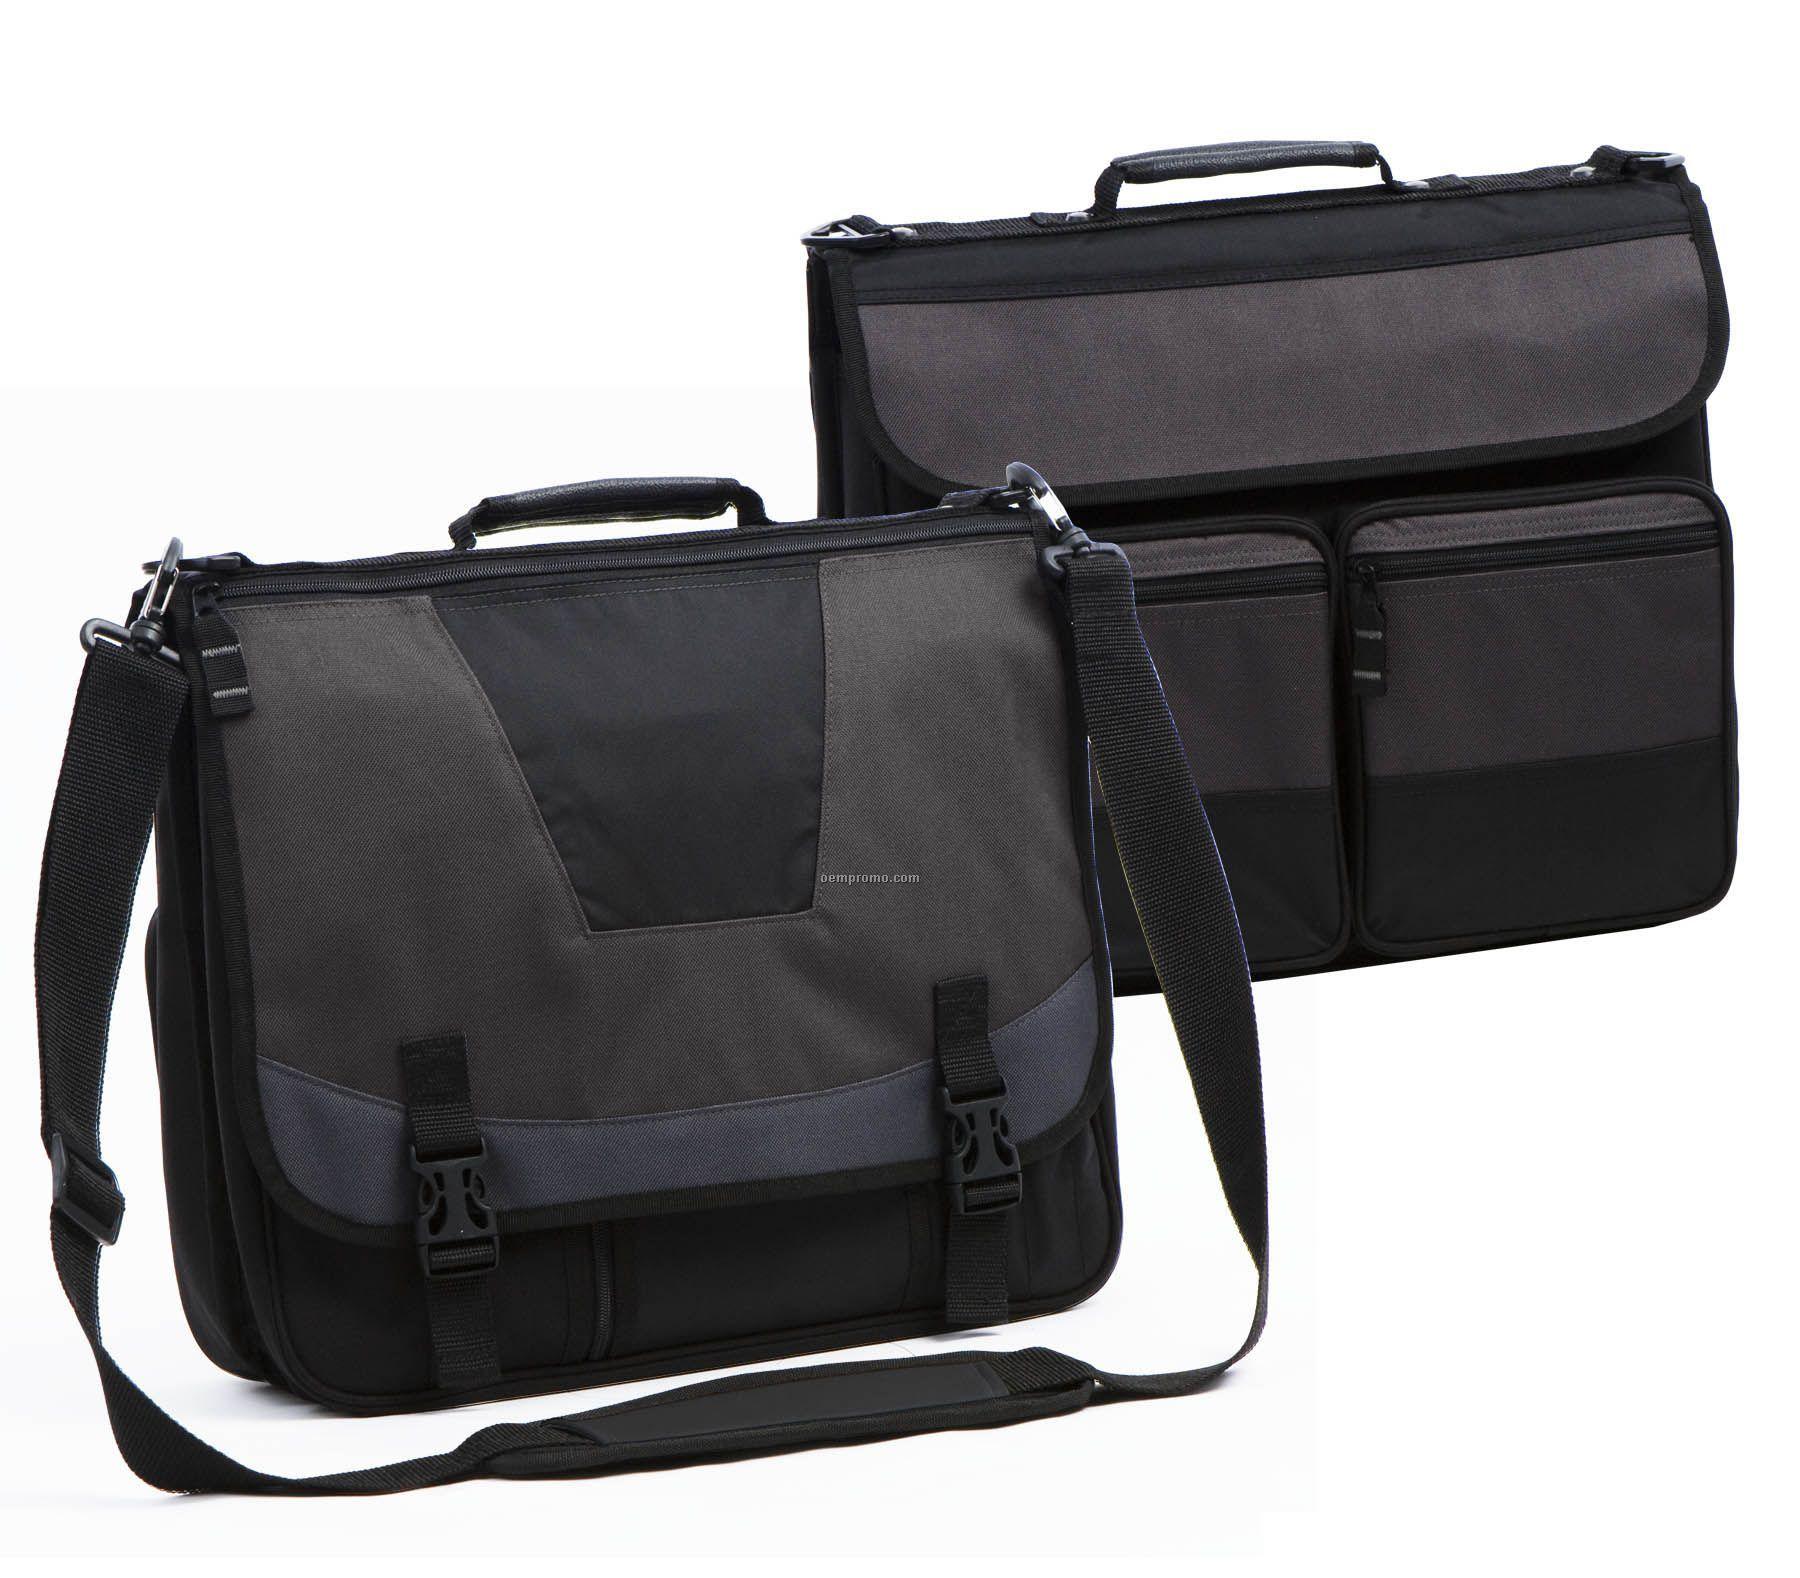 Active Attache Bag